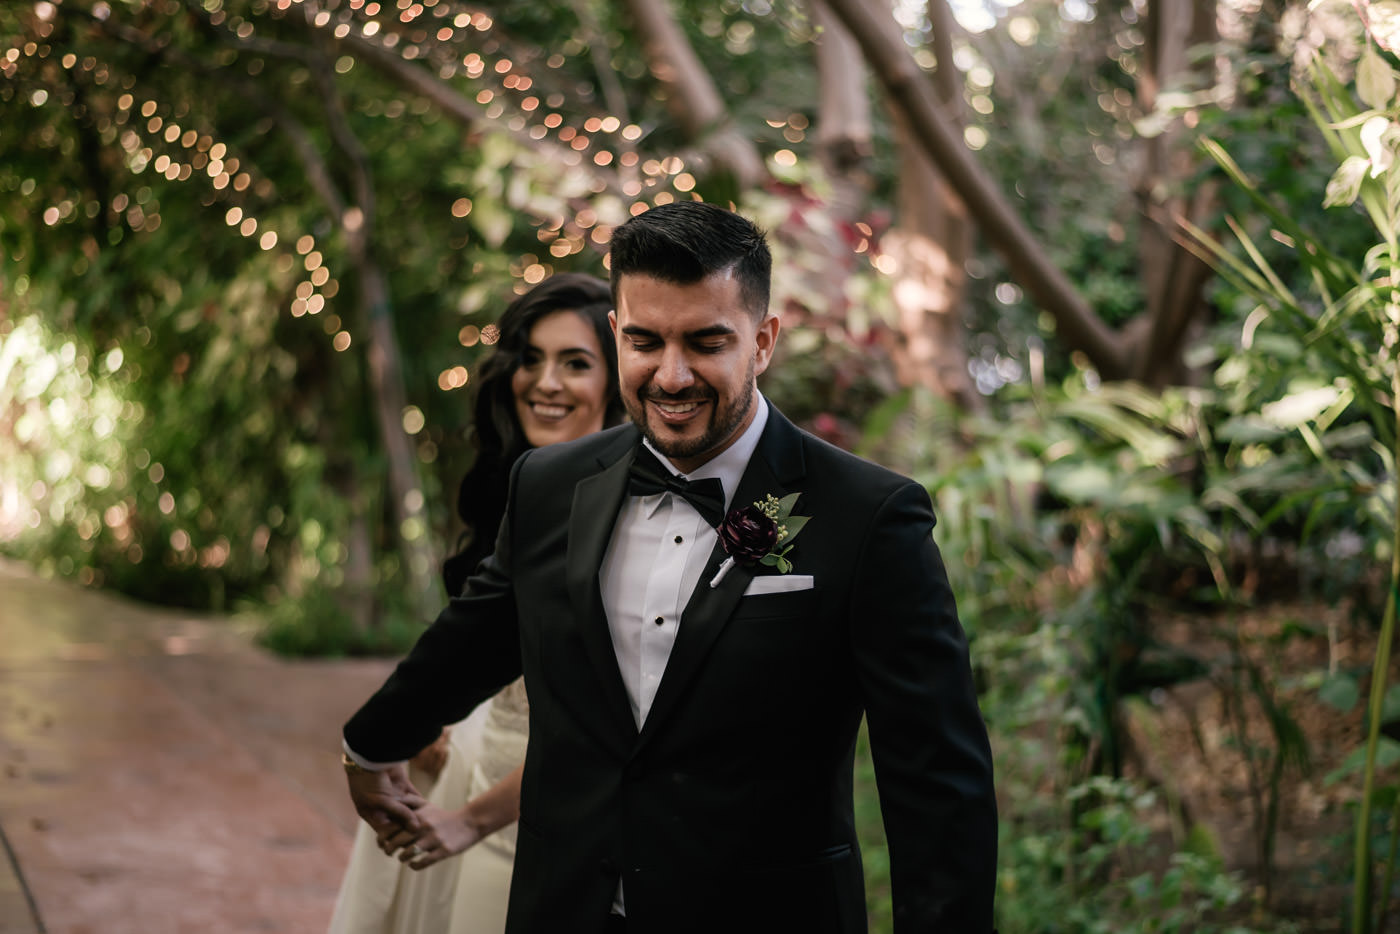 eden-gardens-wedding-photographer-romantic-29.jpg